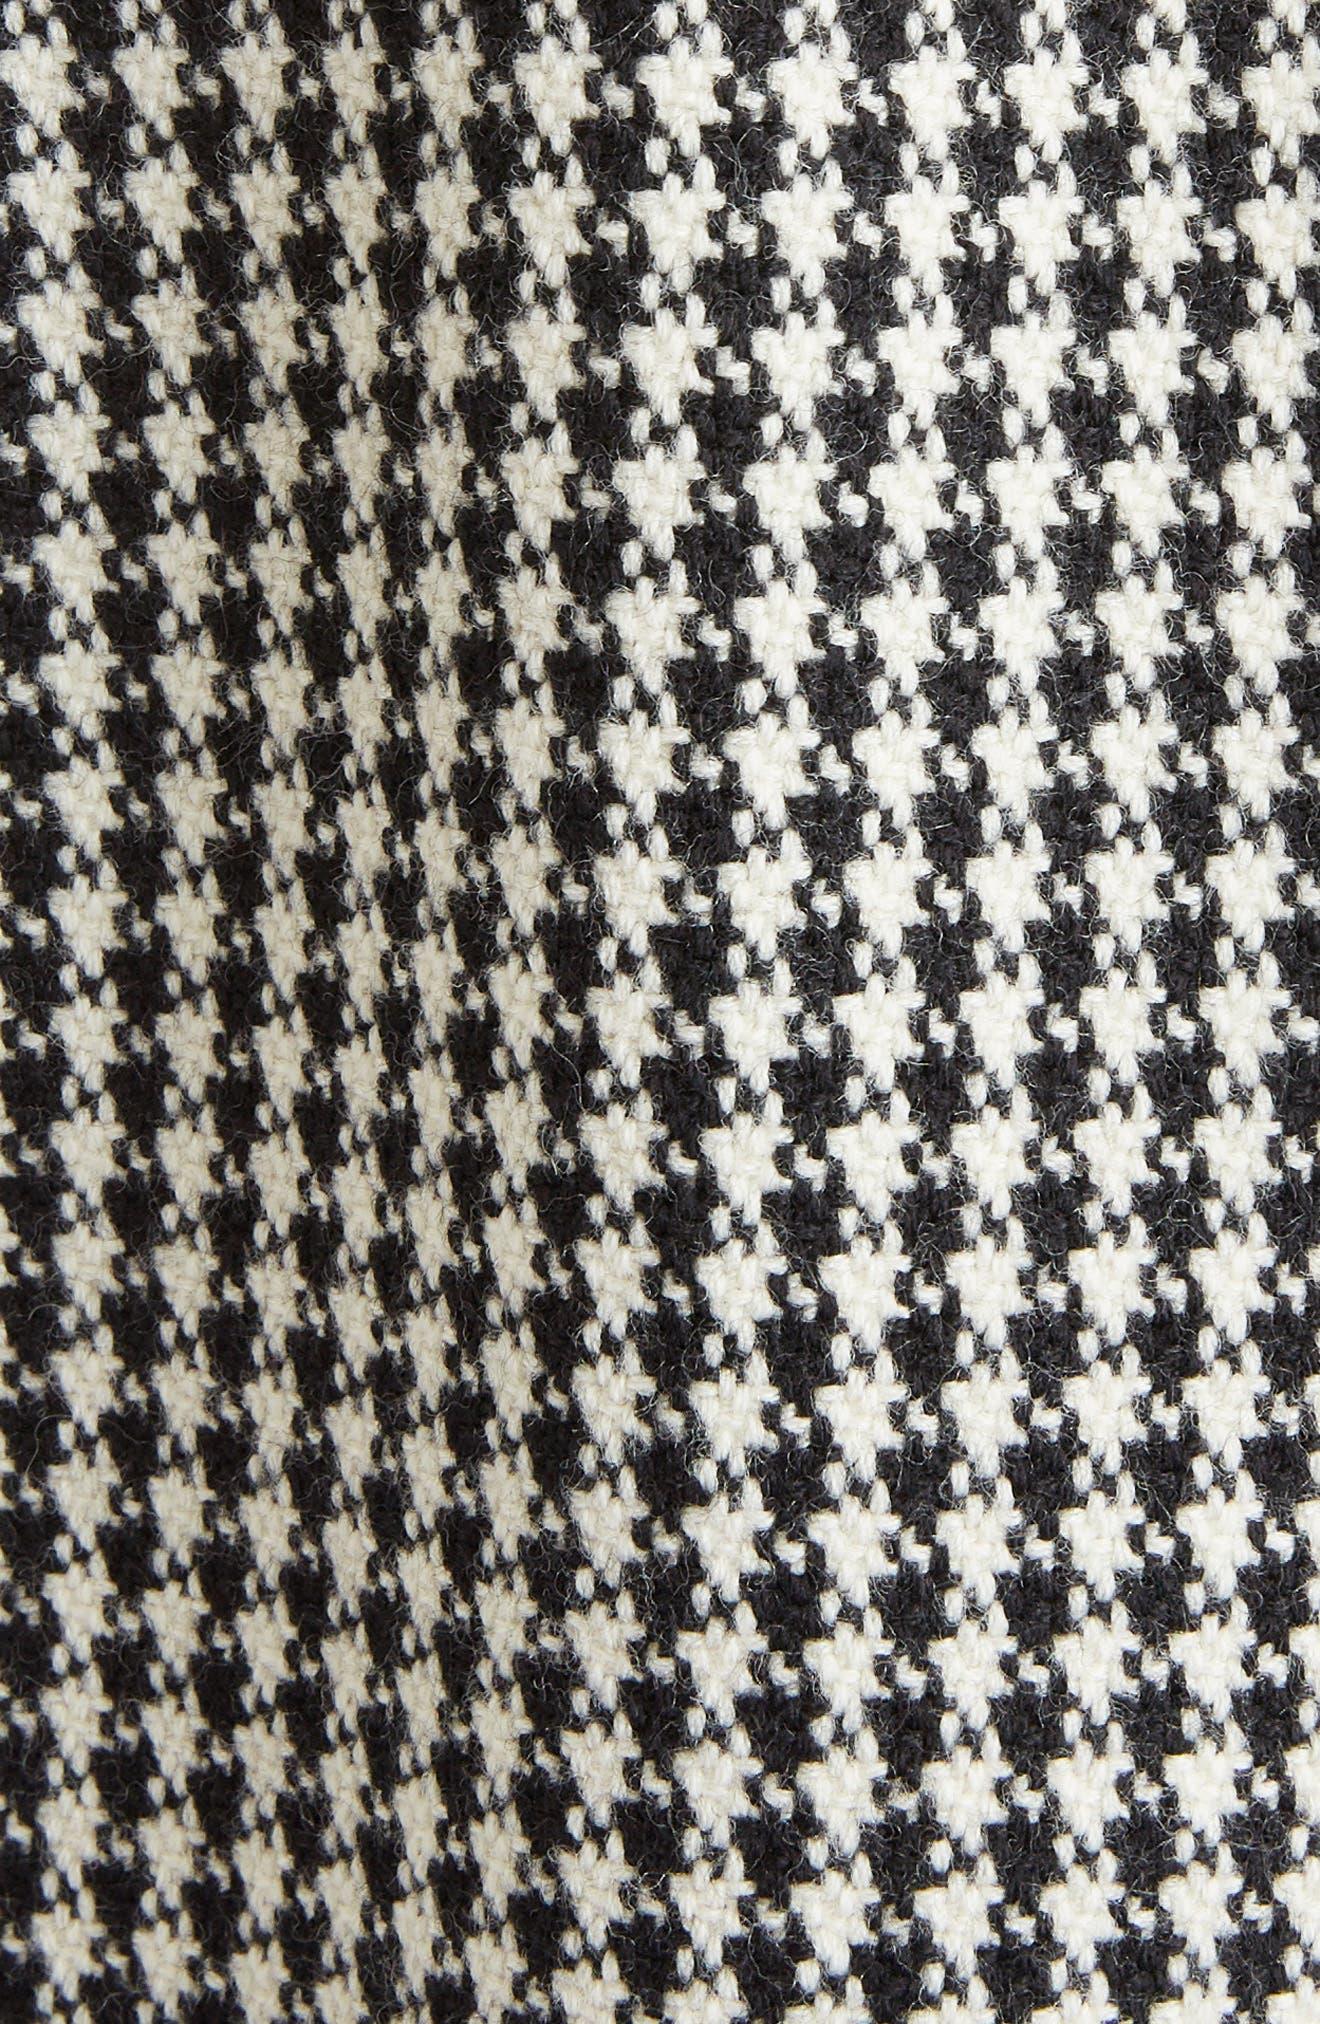 Houndstooth Wool Coat,                             Alternate thumbnail 5, color,                             BLACK NATURAL